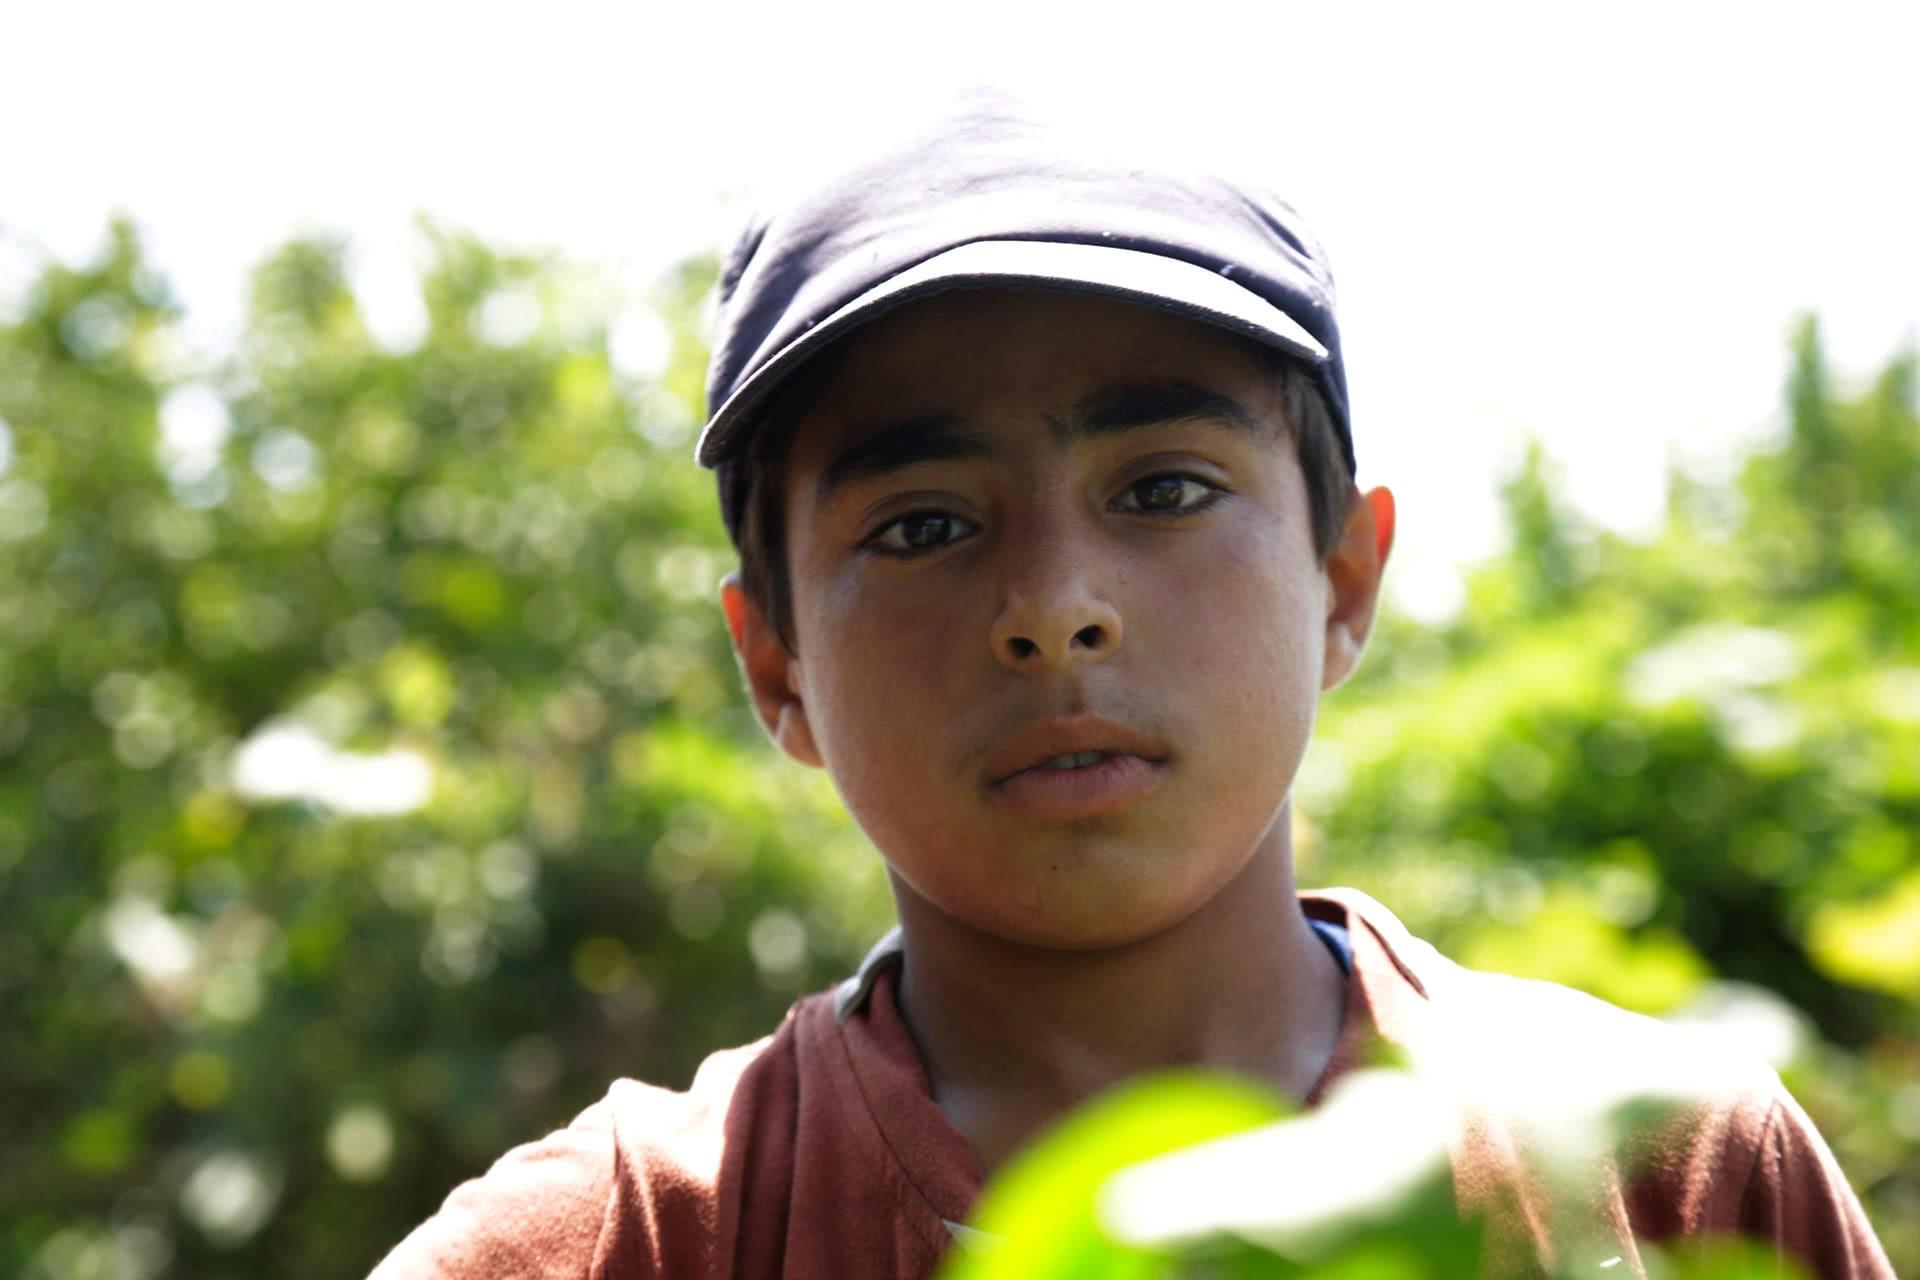 Ahmad Abu Samra, 13, works on his family's land to help provide food for his family. (Photo: DCIP / Saud Abu Ramadan)